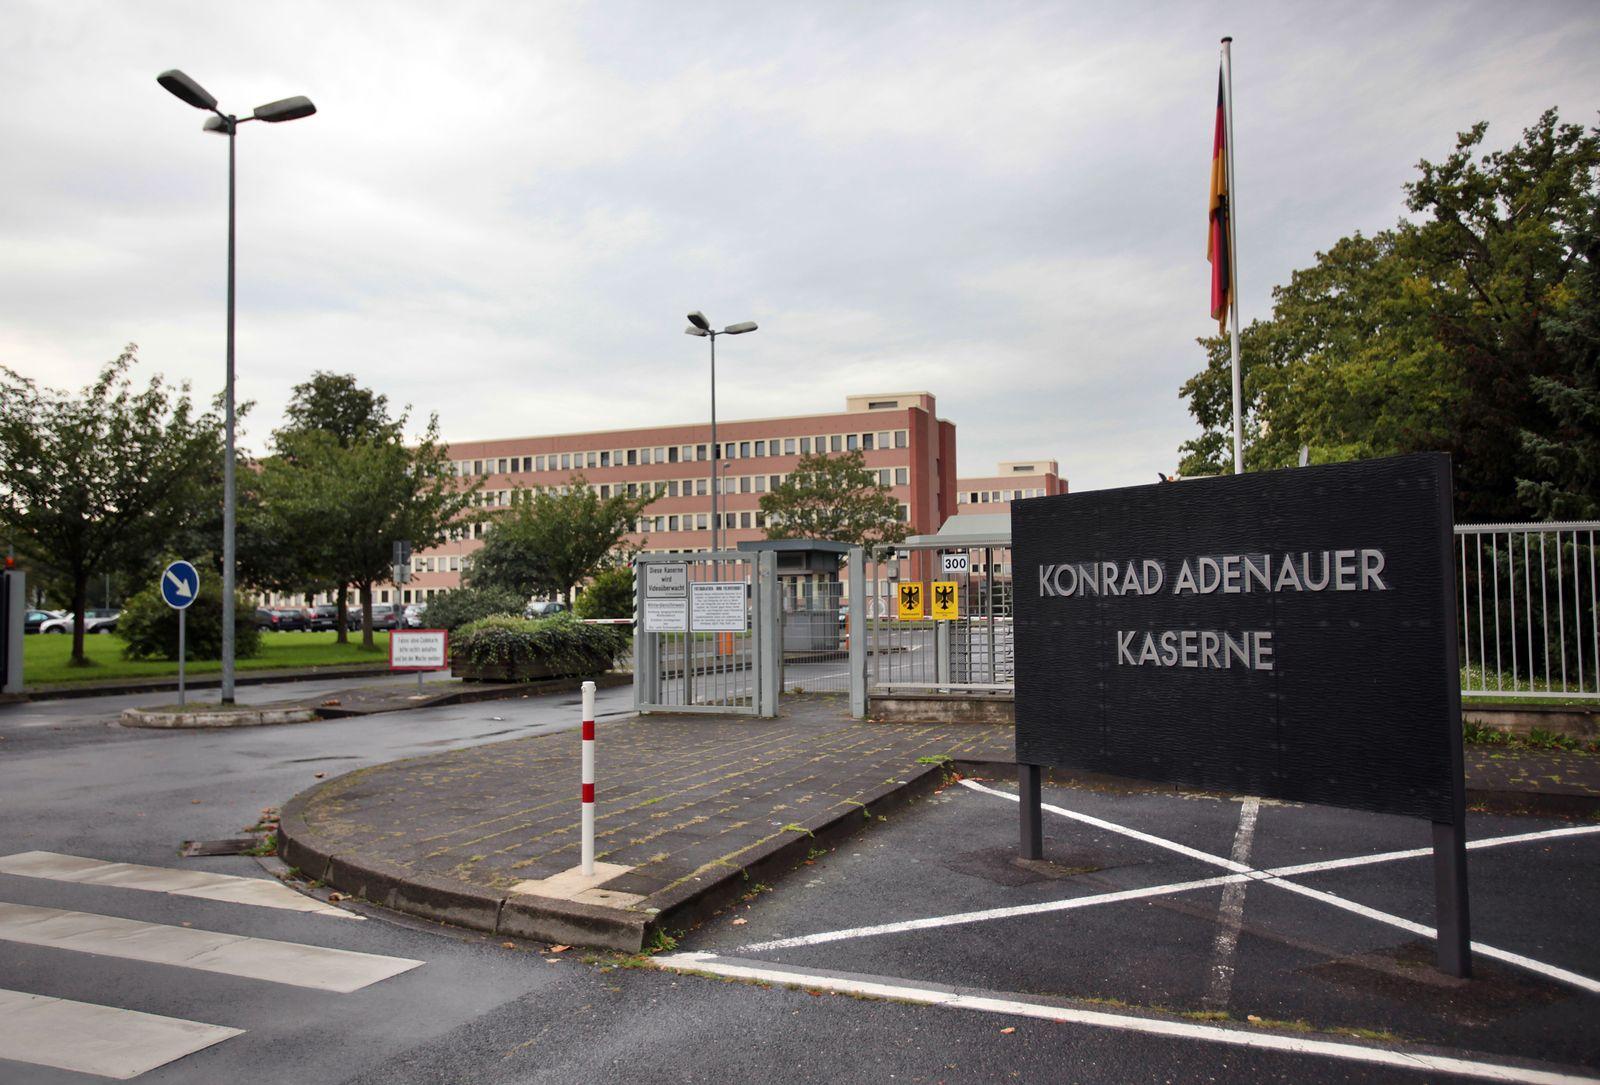 Konrad Adenauer Kaserne Köln / MAD